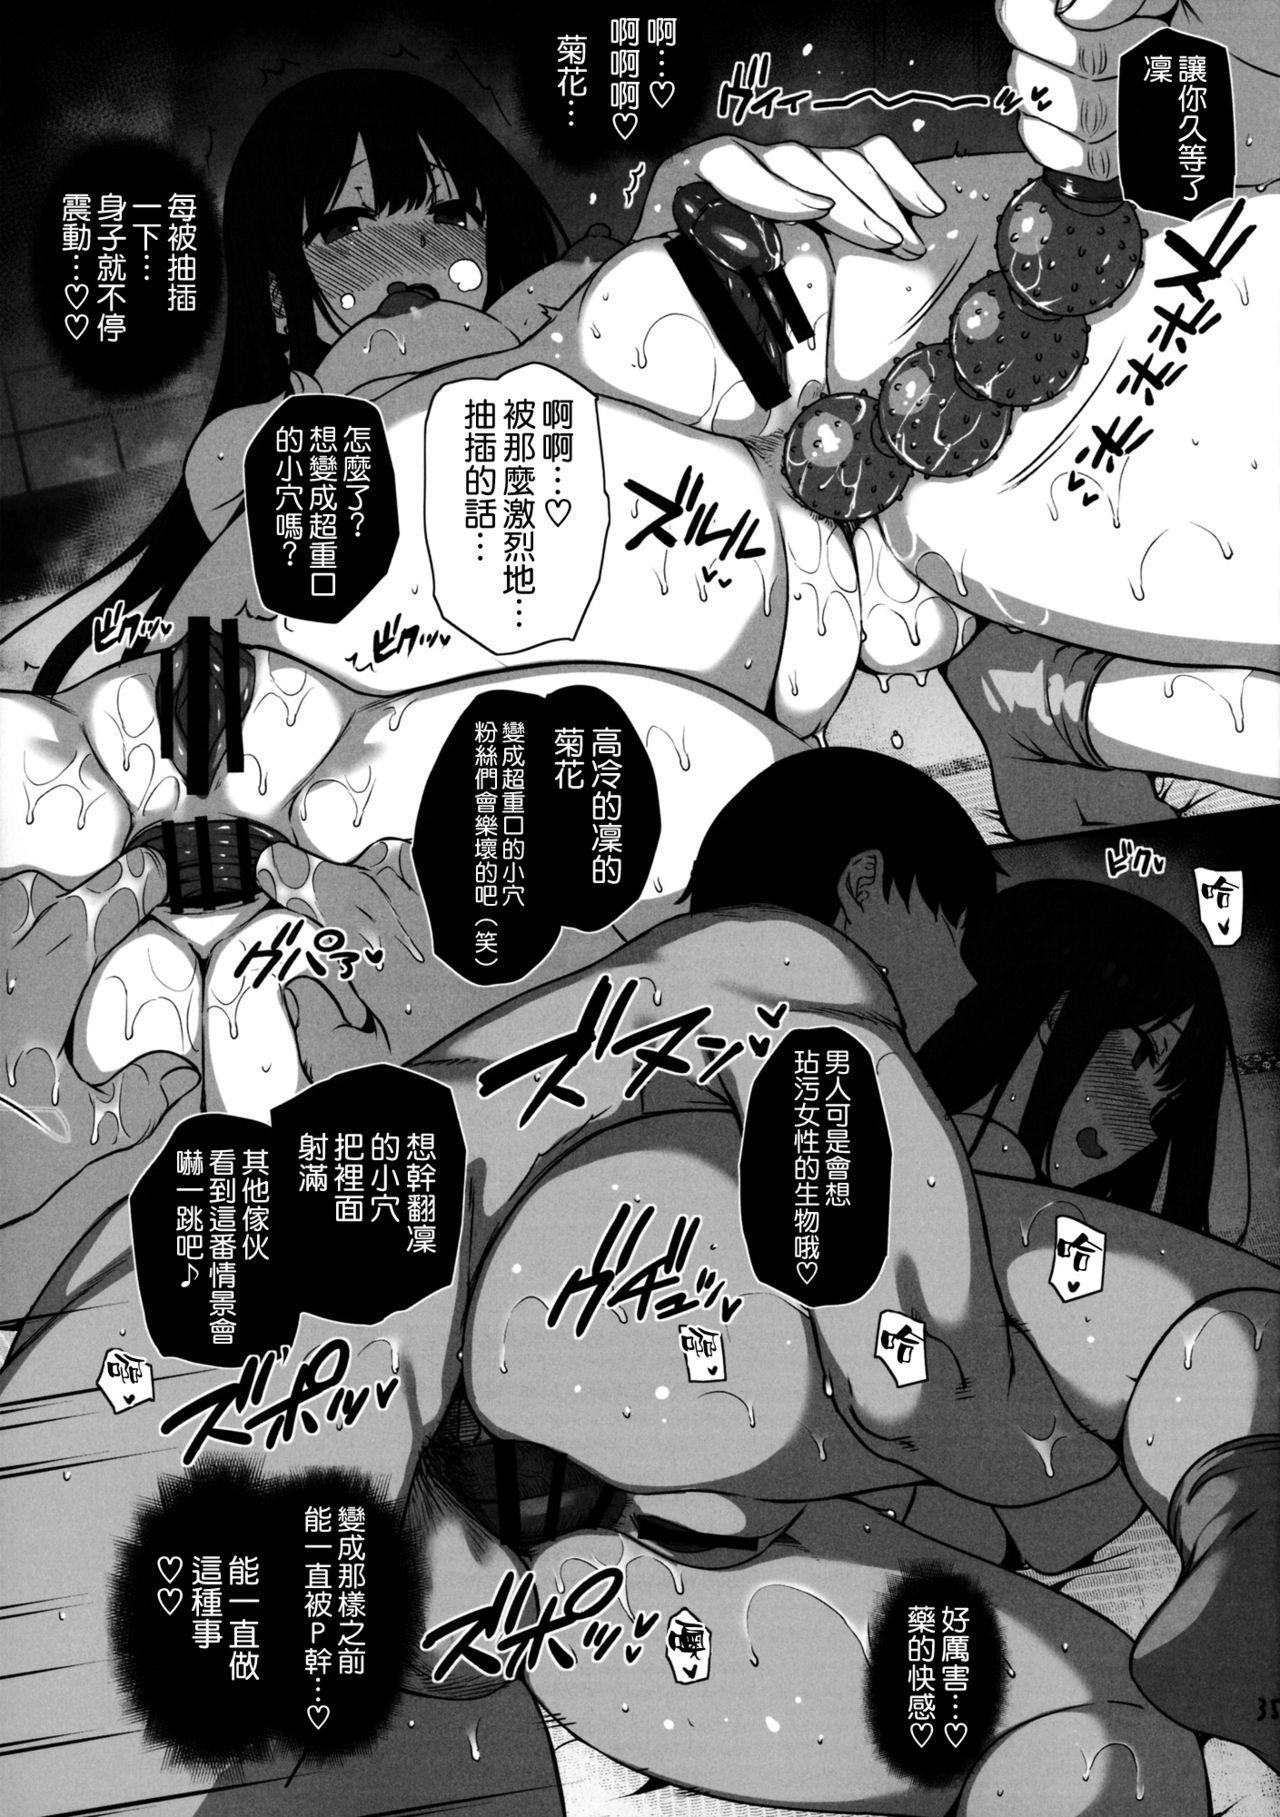 (C92) [Basutei Shower (Katsurai Yoshiaki)] Inran NUDIE TRIP ~sex harem 02~ + Omake Clear File (THE IDOLM@STER CINDERELLA GIRLS) [Chinese] [空気系☆漢化] 36